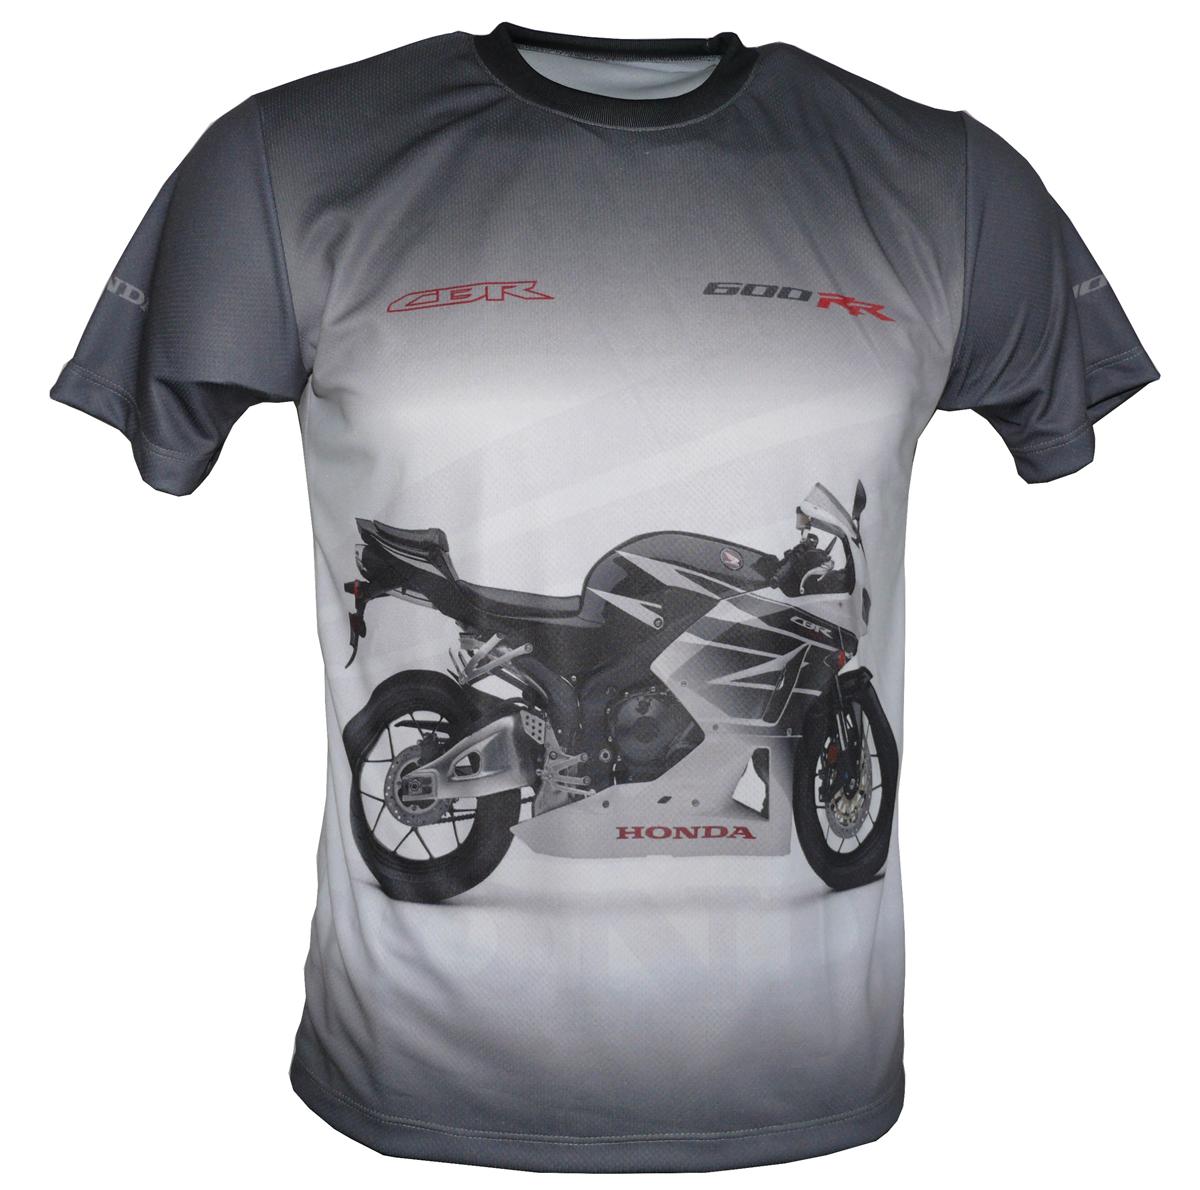 T-shirt  for bike HONDA CBR600RR Tshirt CBR 600RR motorcycle CBR 600 RR moto